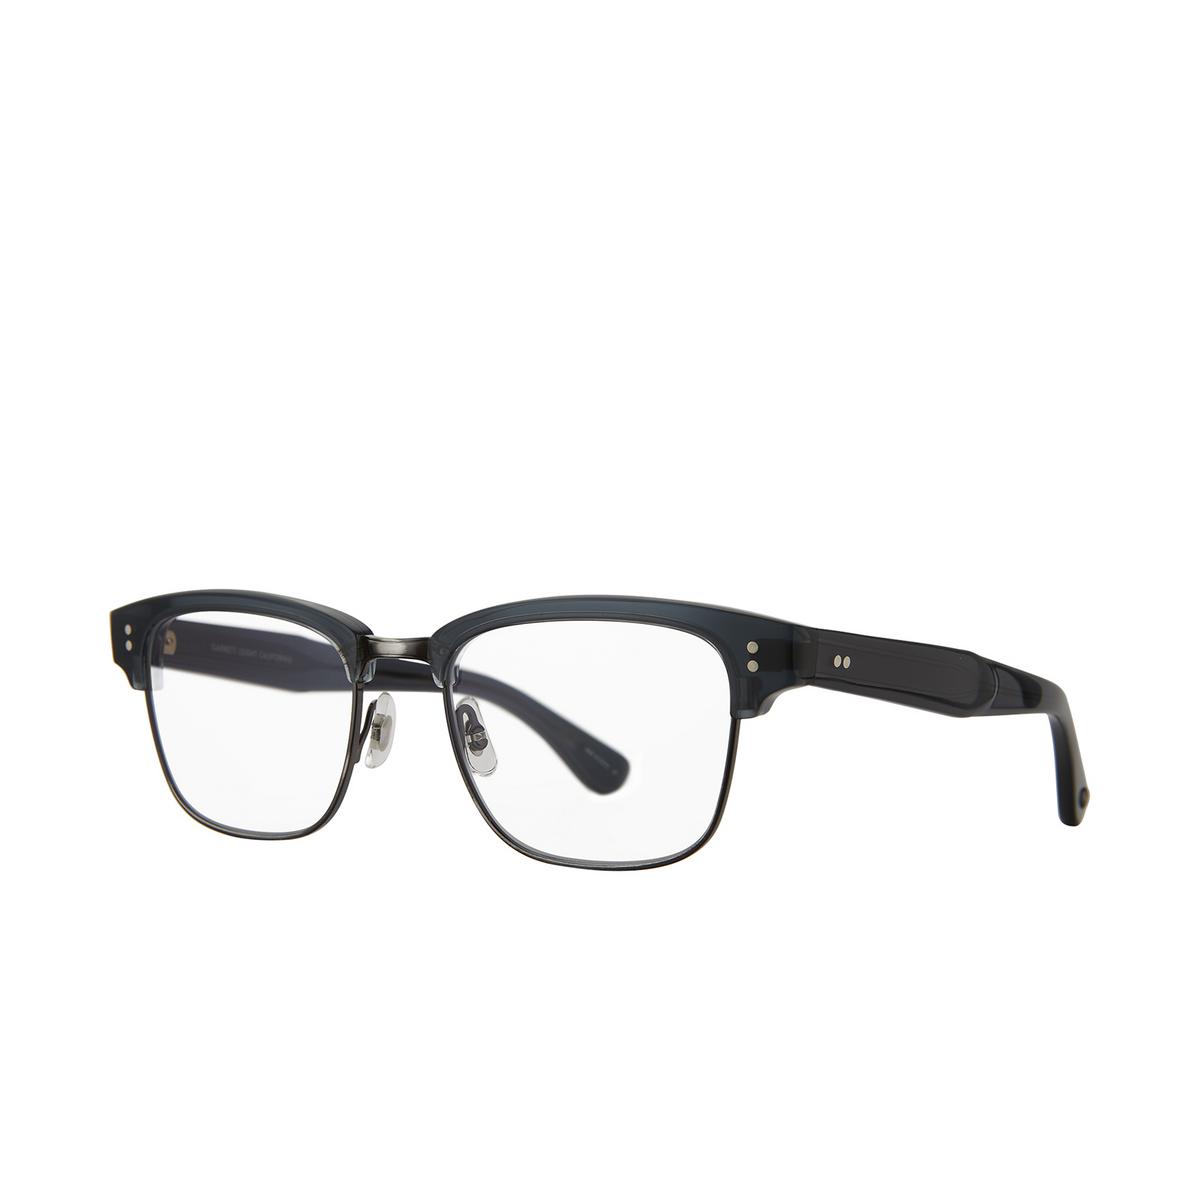 Garrett Leight® Square Eyeglasses: Gibson color Navy - Pewter Nvy-pw.